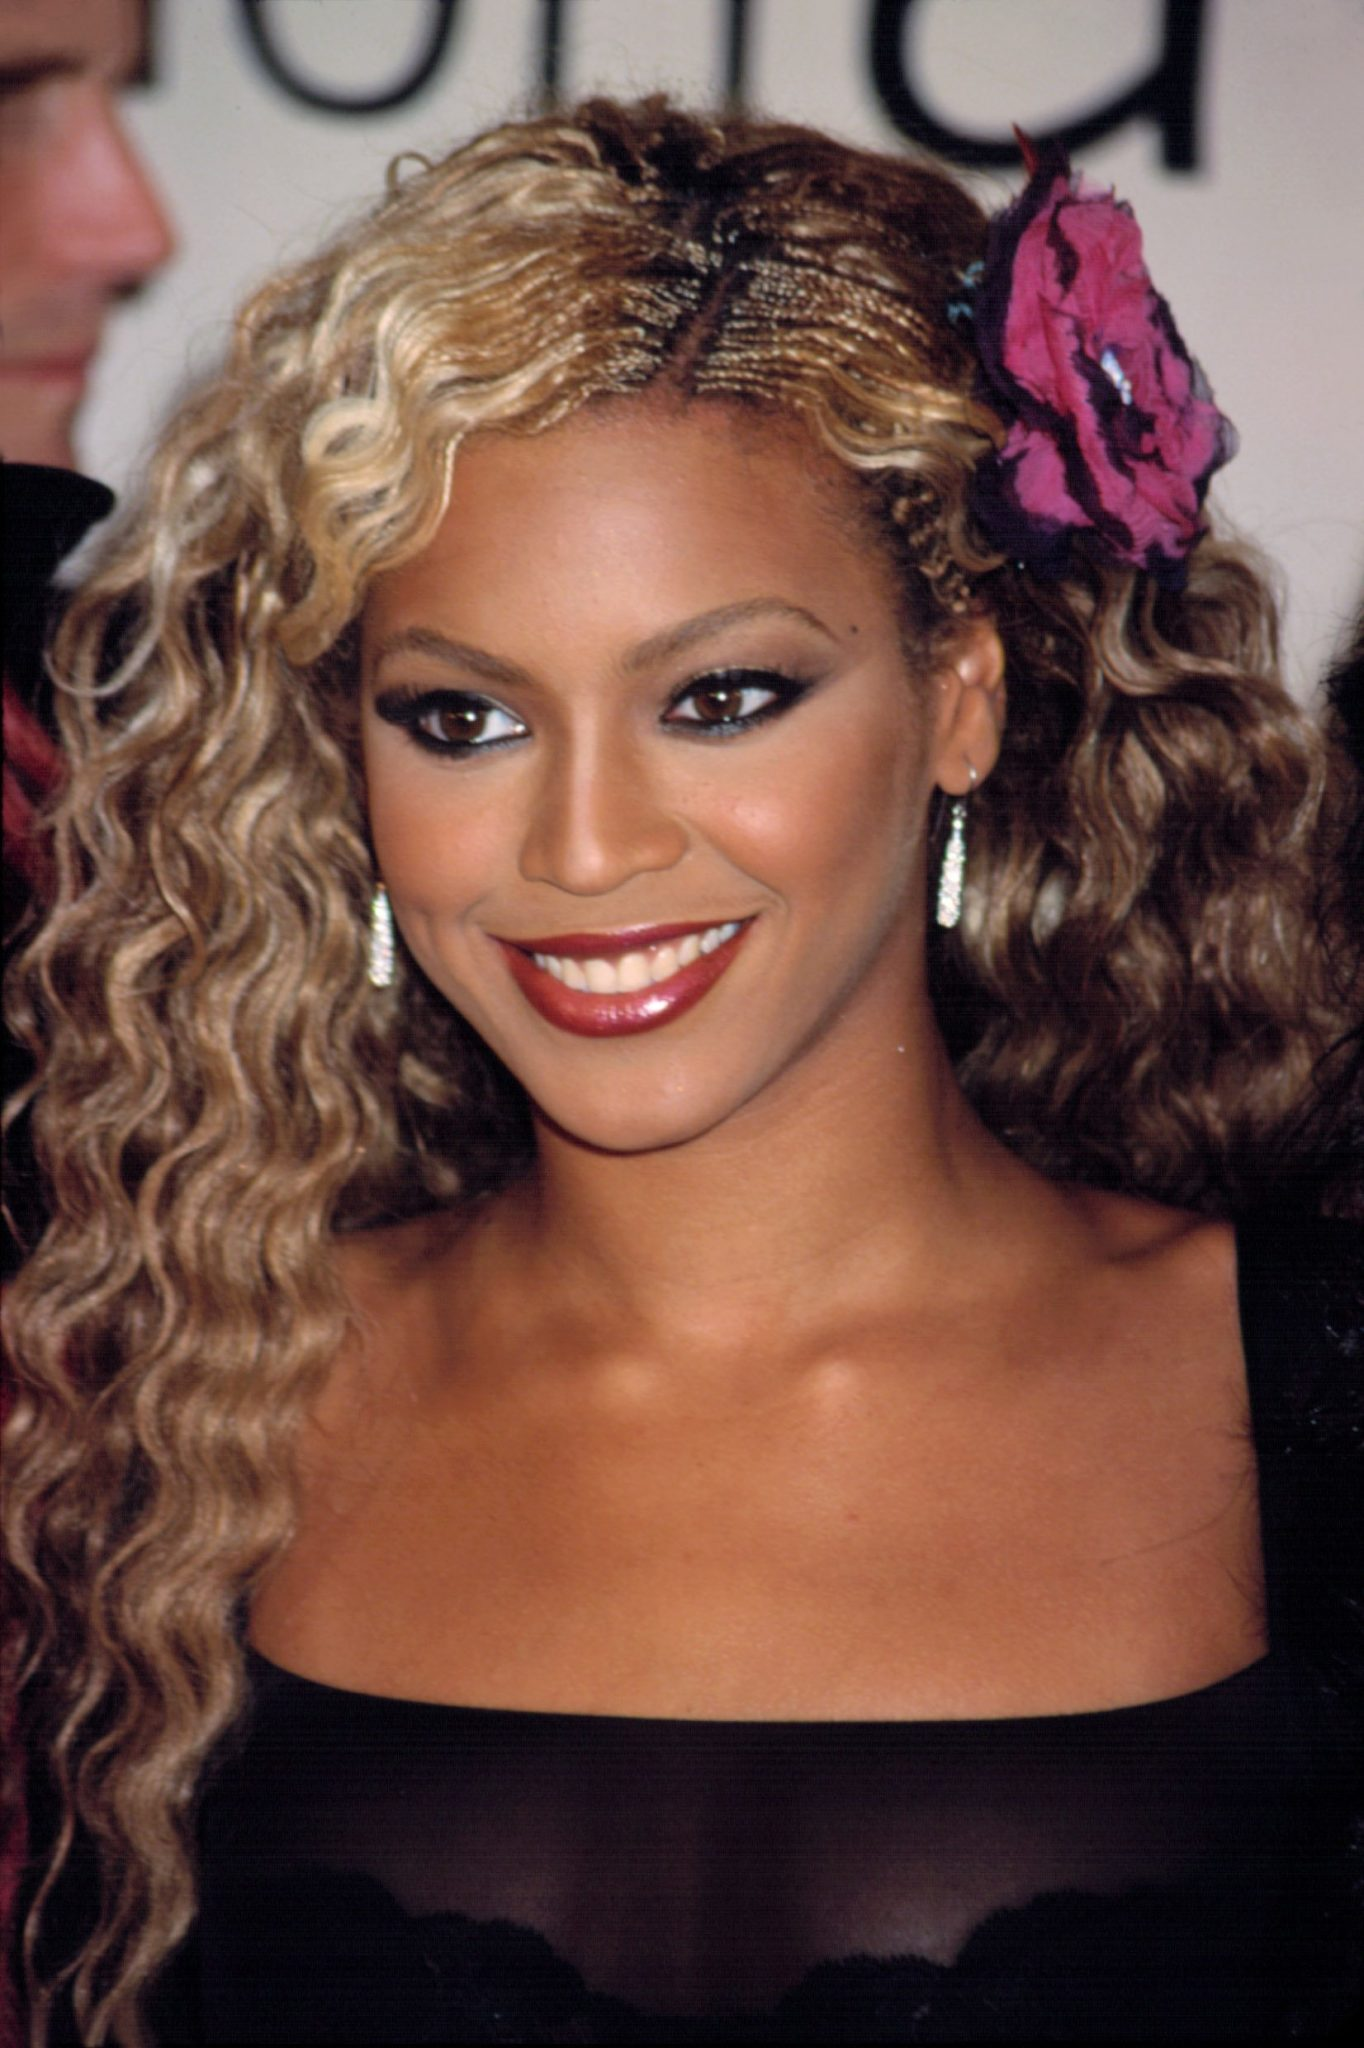 10 Most Famous Accused Celebrity Illuminati